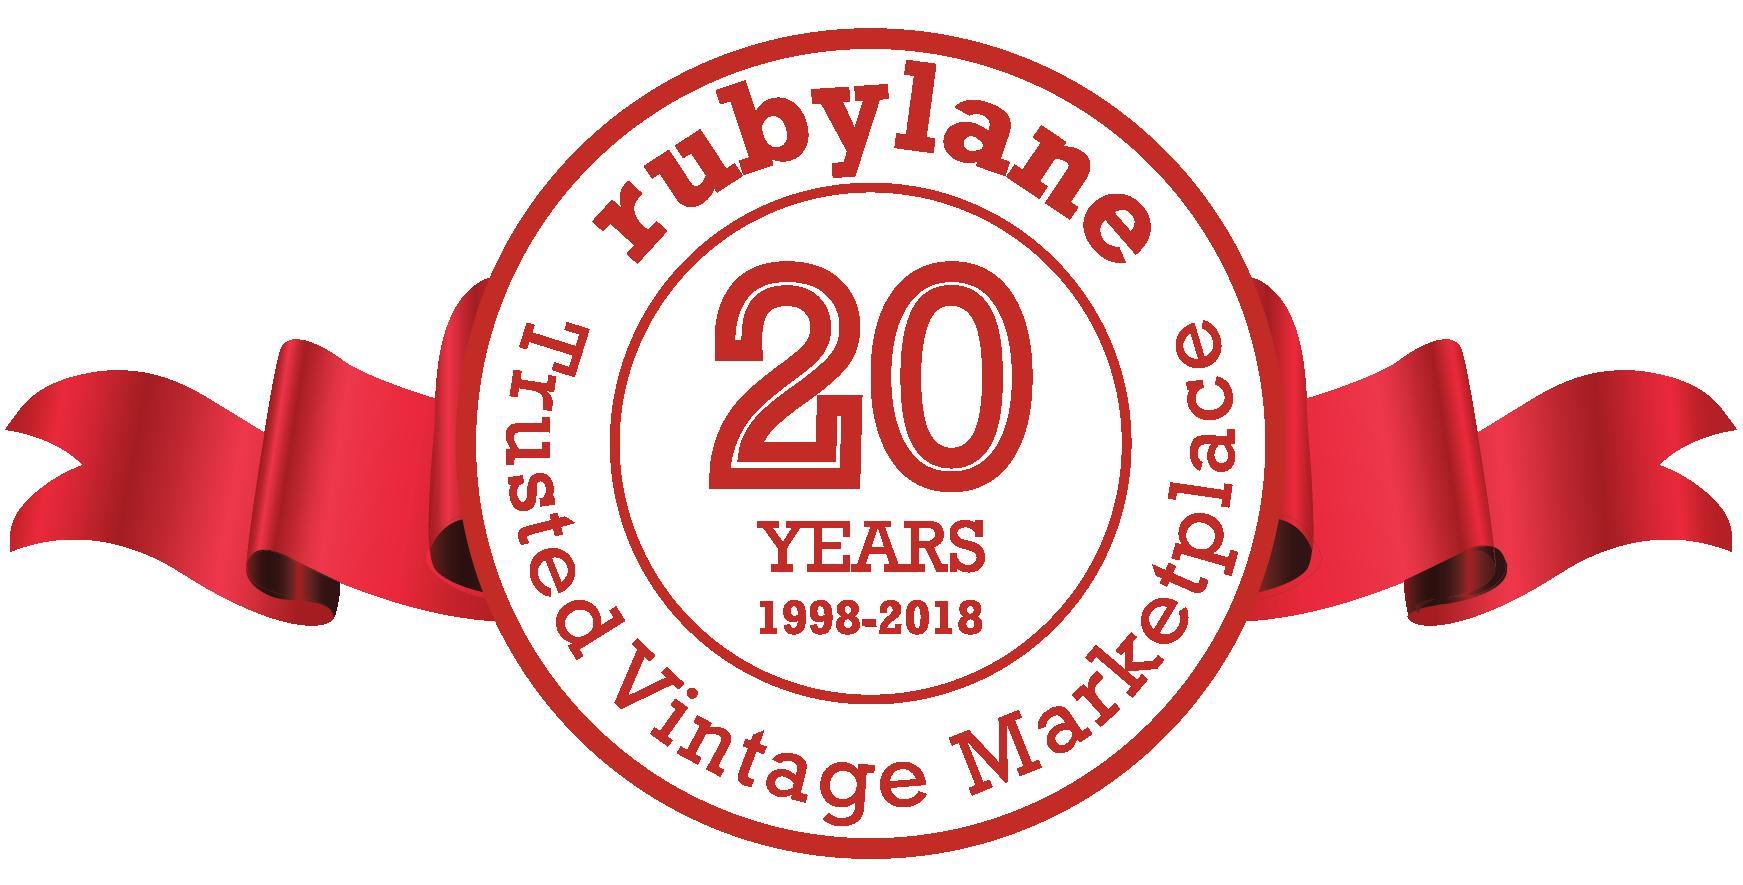 Ruby Lane Celebrates 20th Anniversary